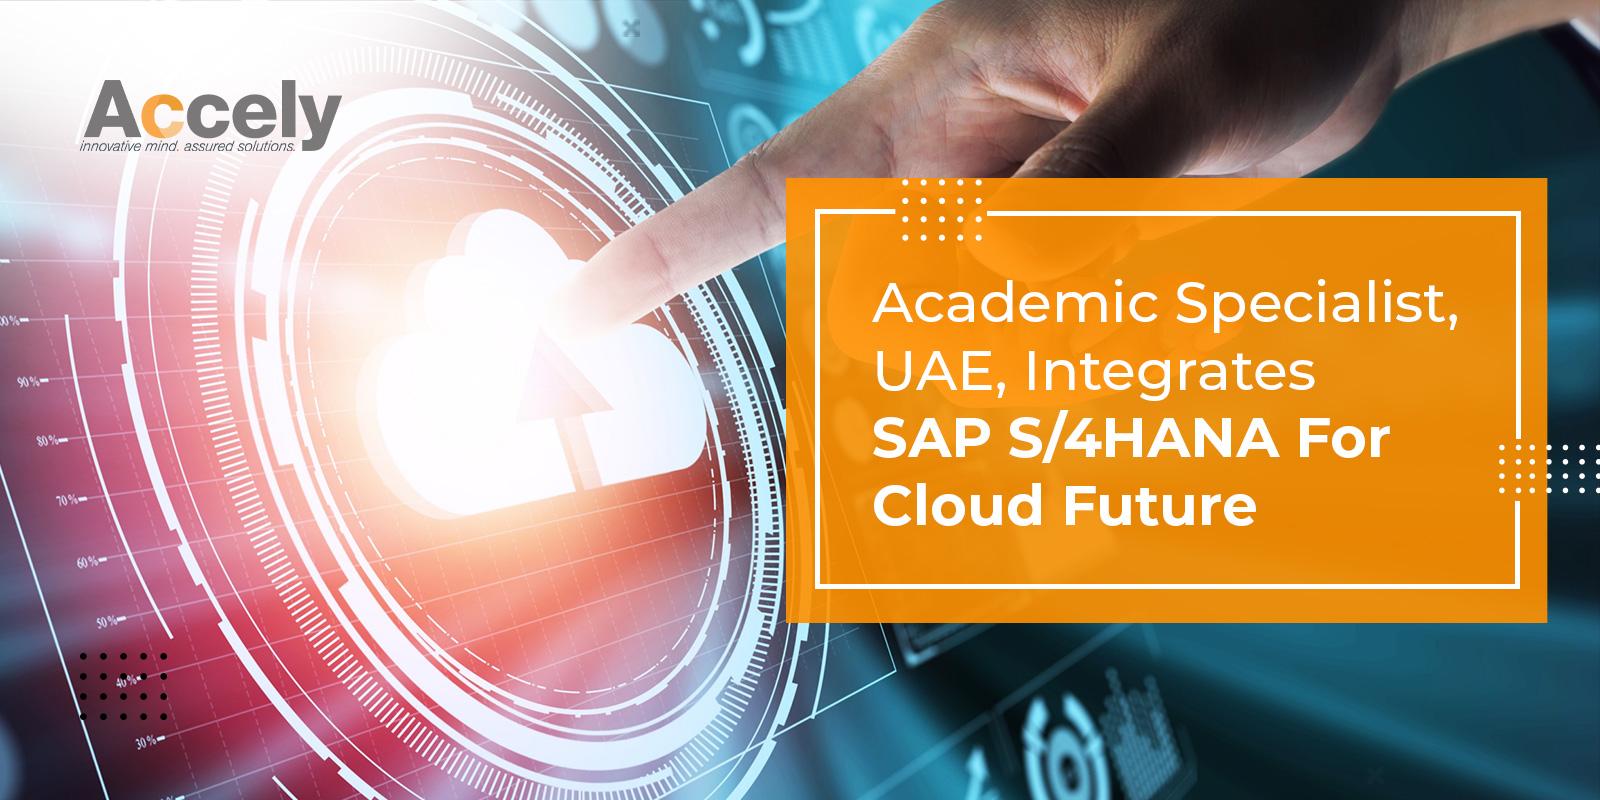 Academic Specialist, UAE, Integrates SAP S/4HANA For Cloud Future